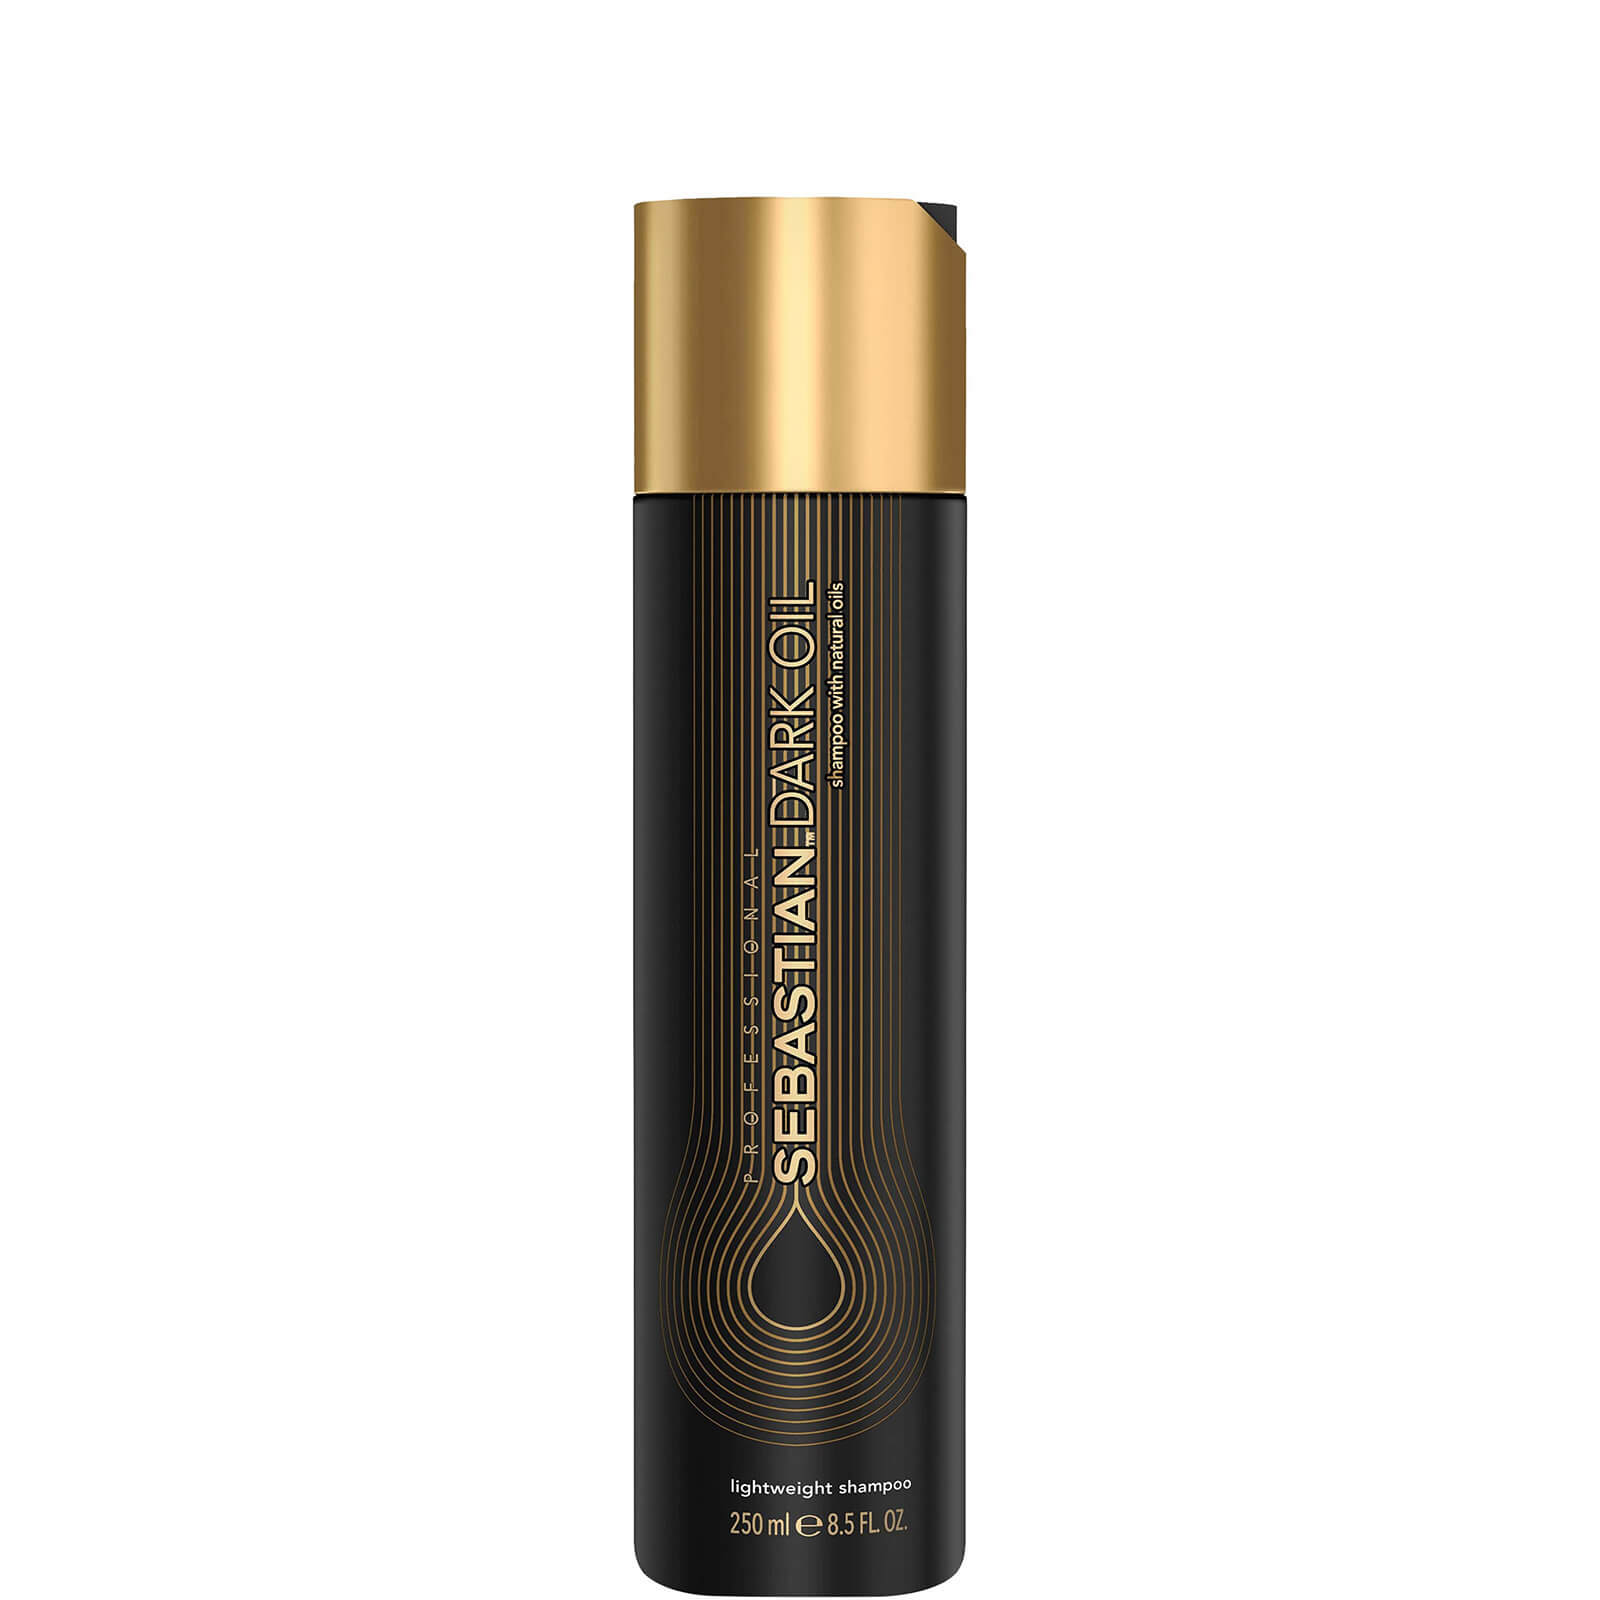 Sebastian Professional Dark Oil Lightweight Shampoo 1000ml